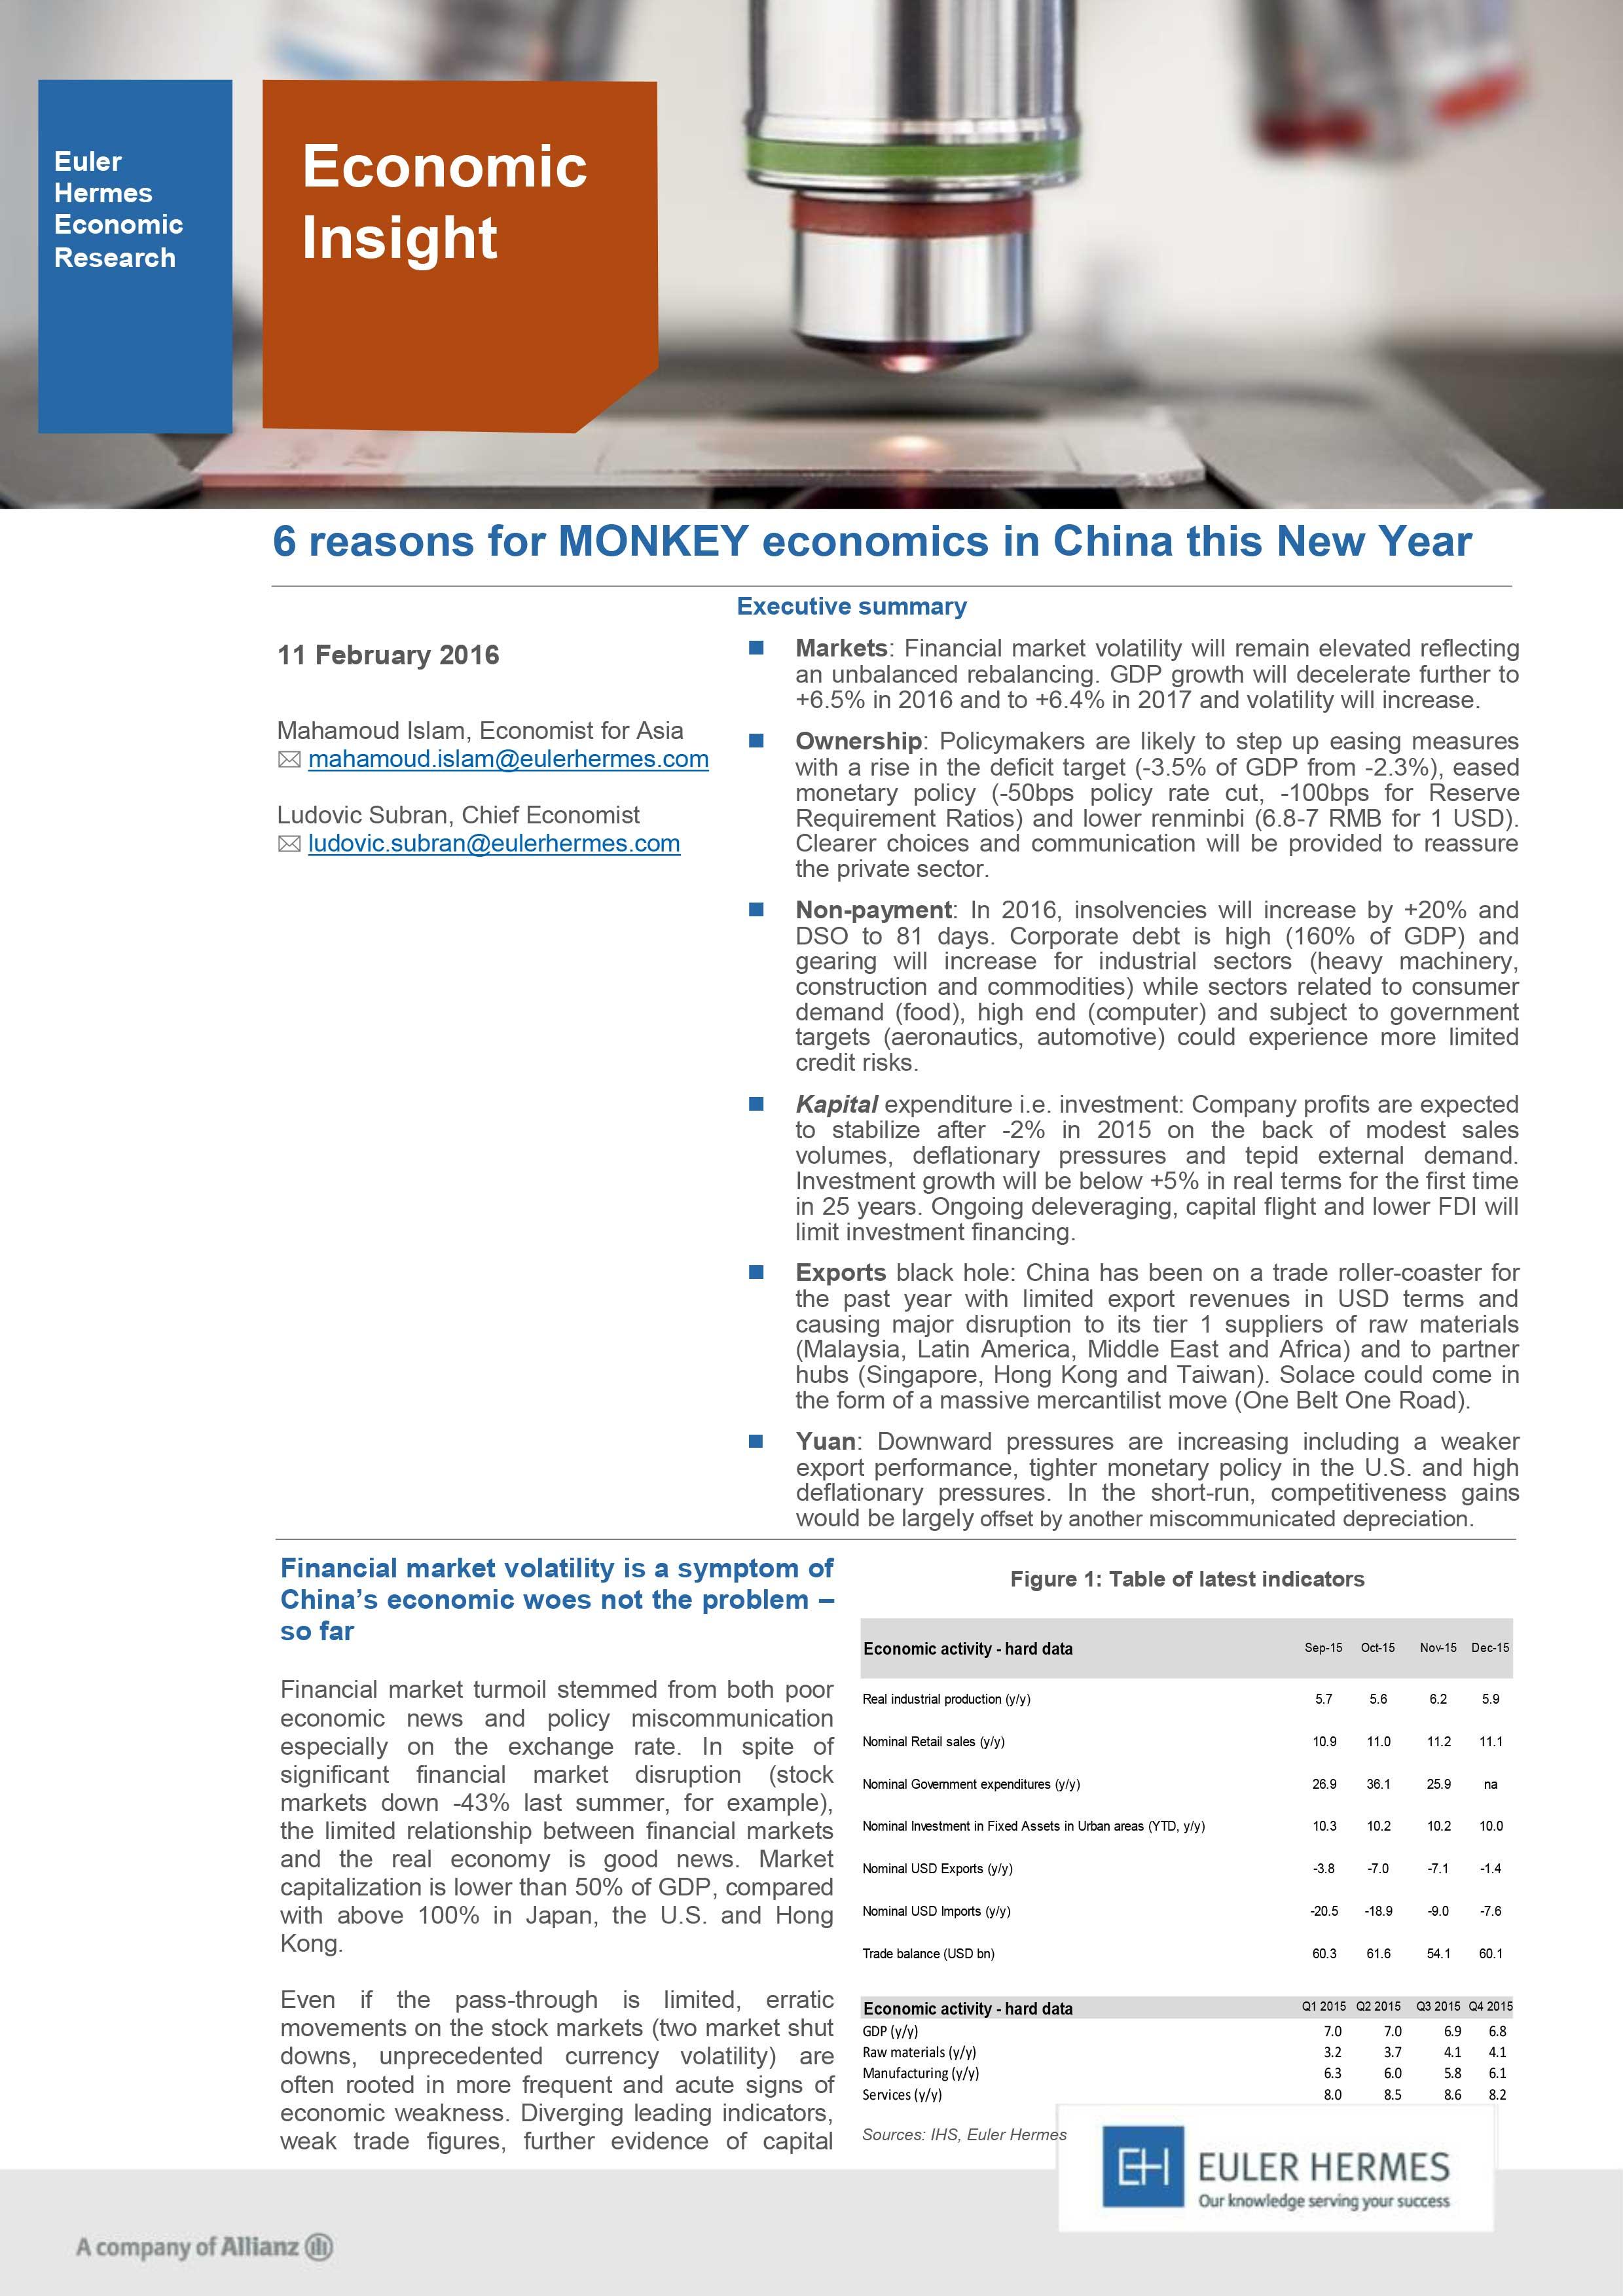 Economic-Insight-6-reasons-monkey-economics-china-fev16